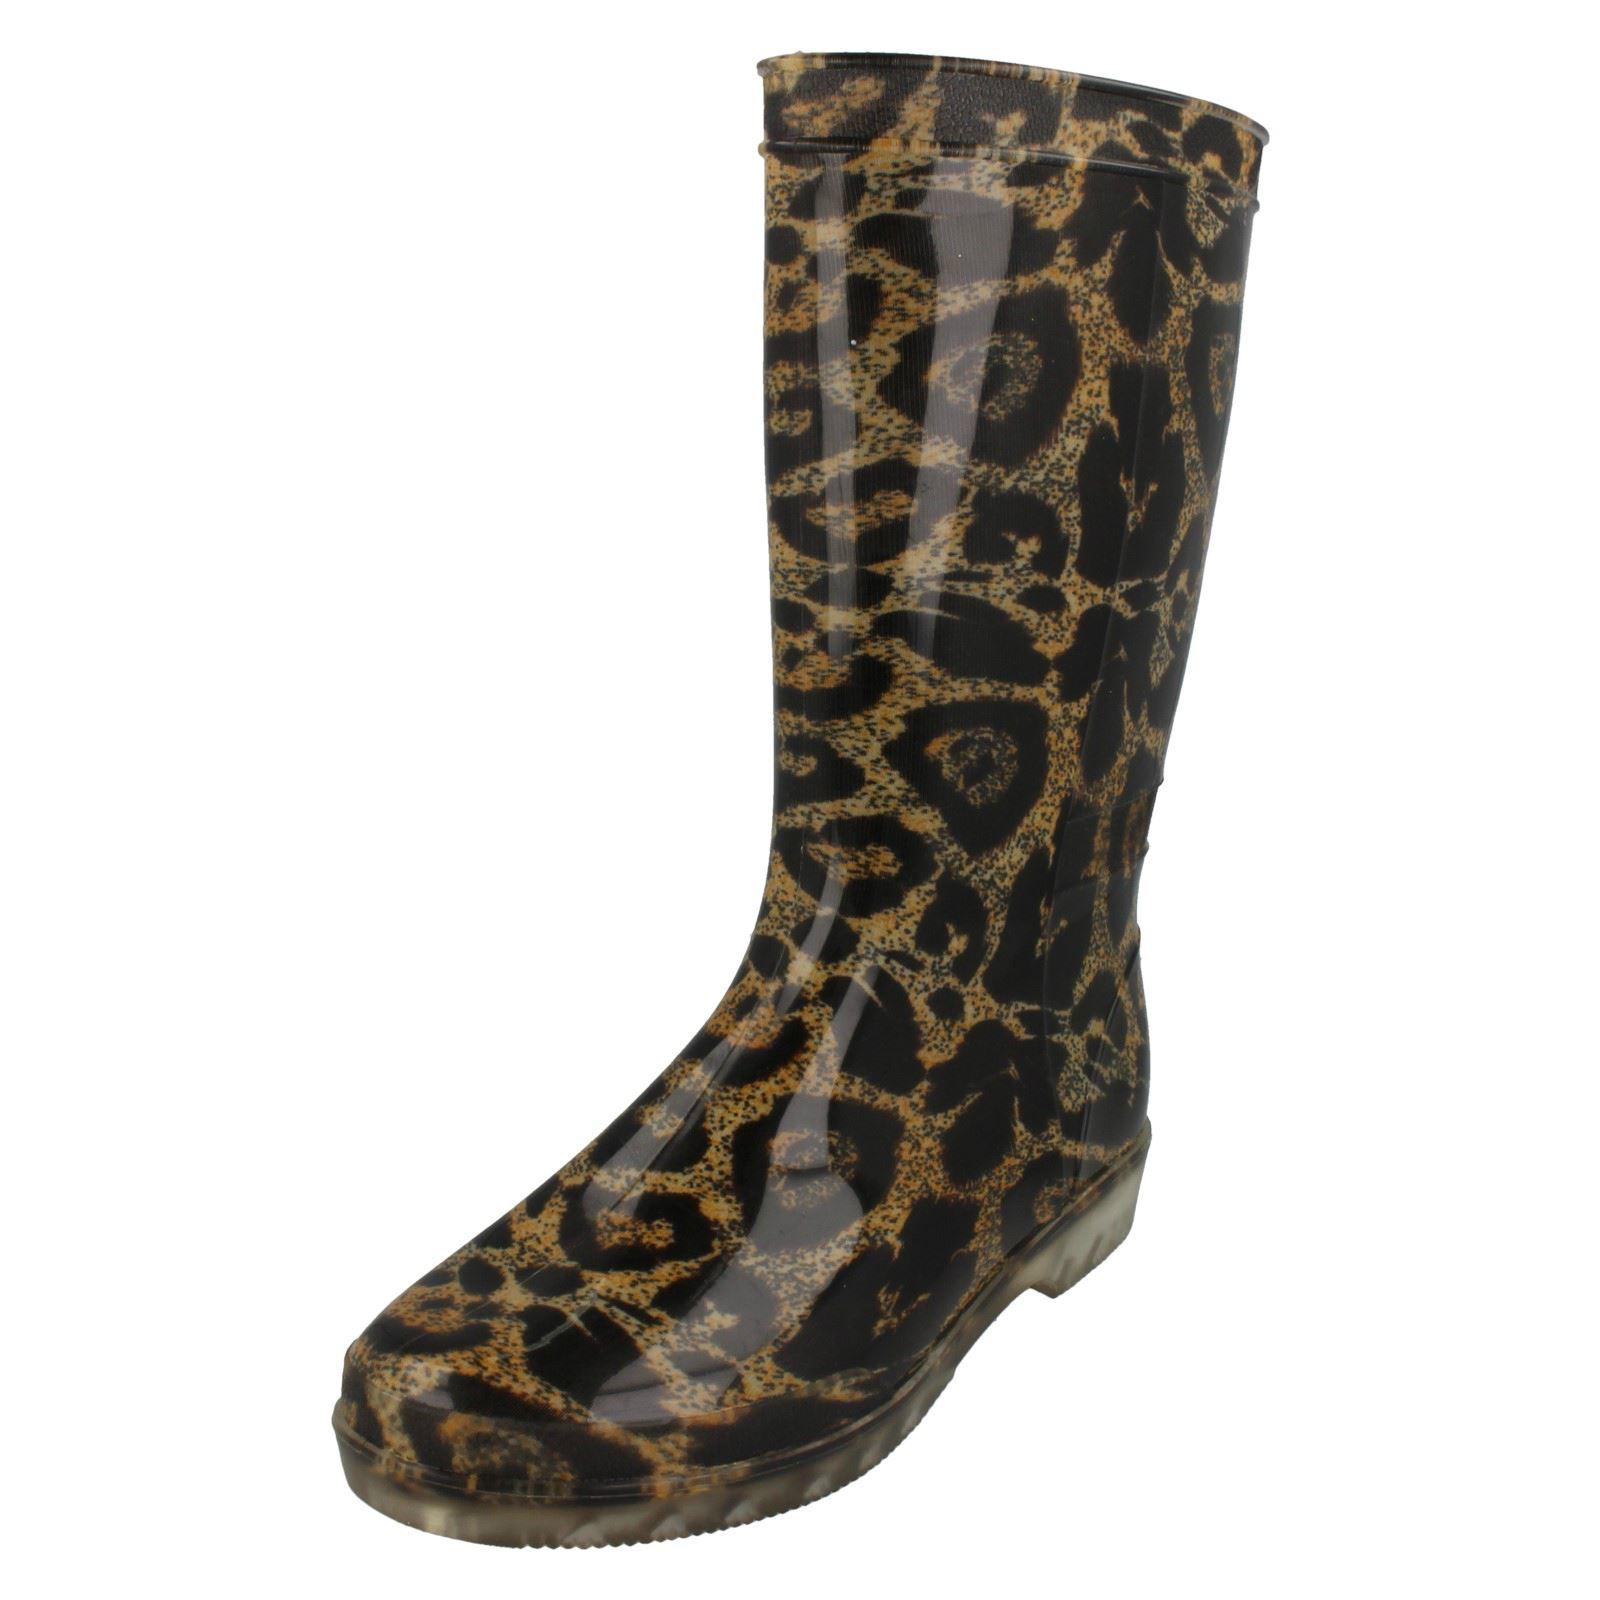 Mujer Spot On - CAÑA ALTA Estampado Leopardo Botas De Agua